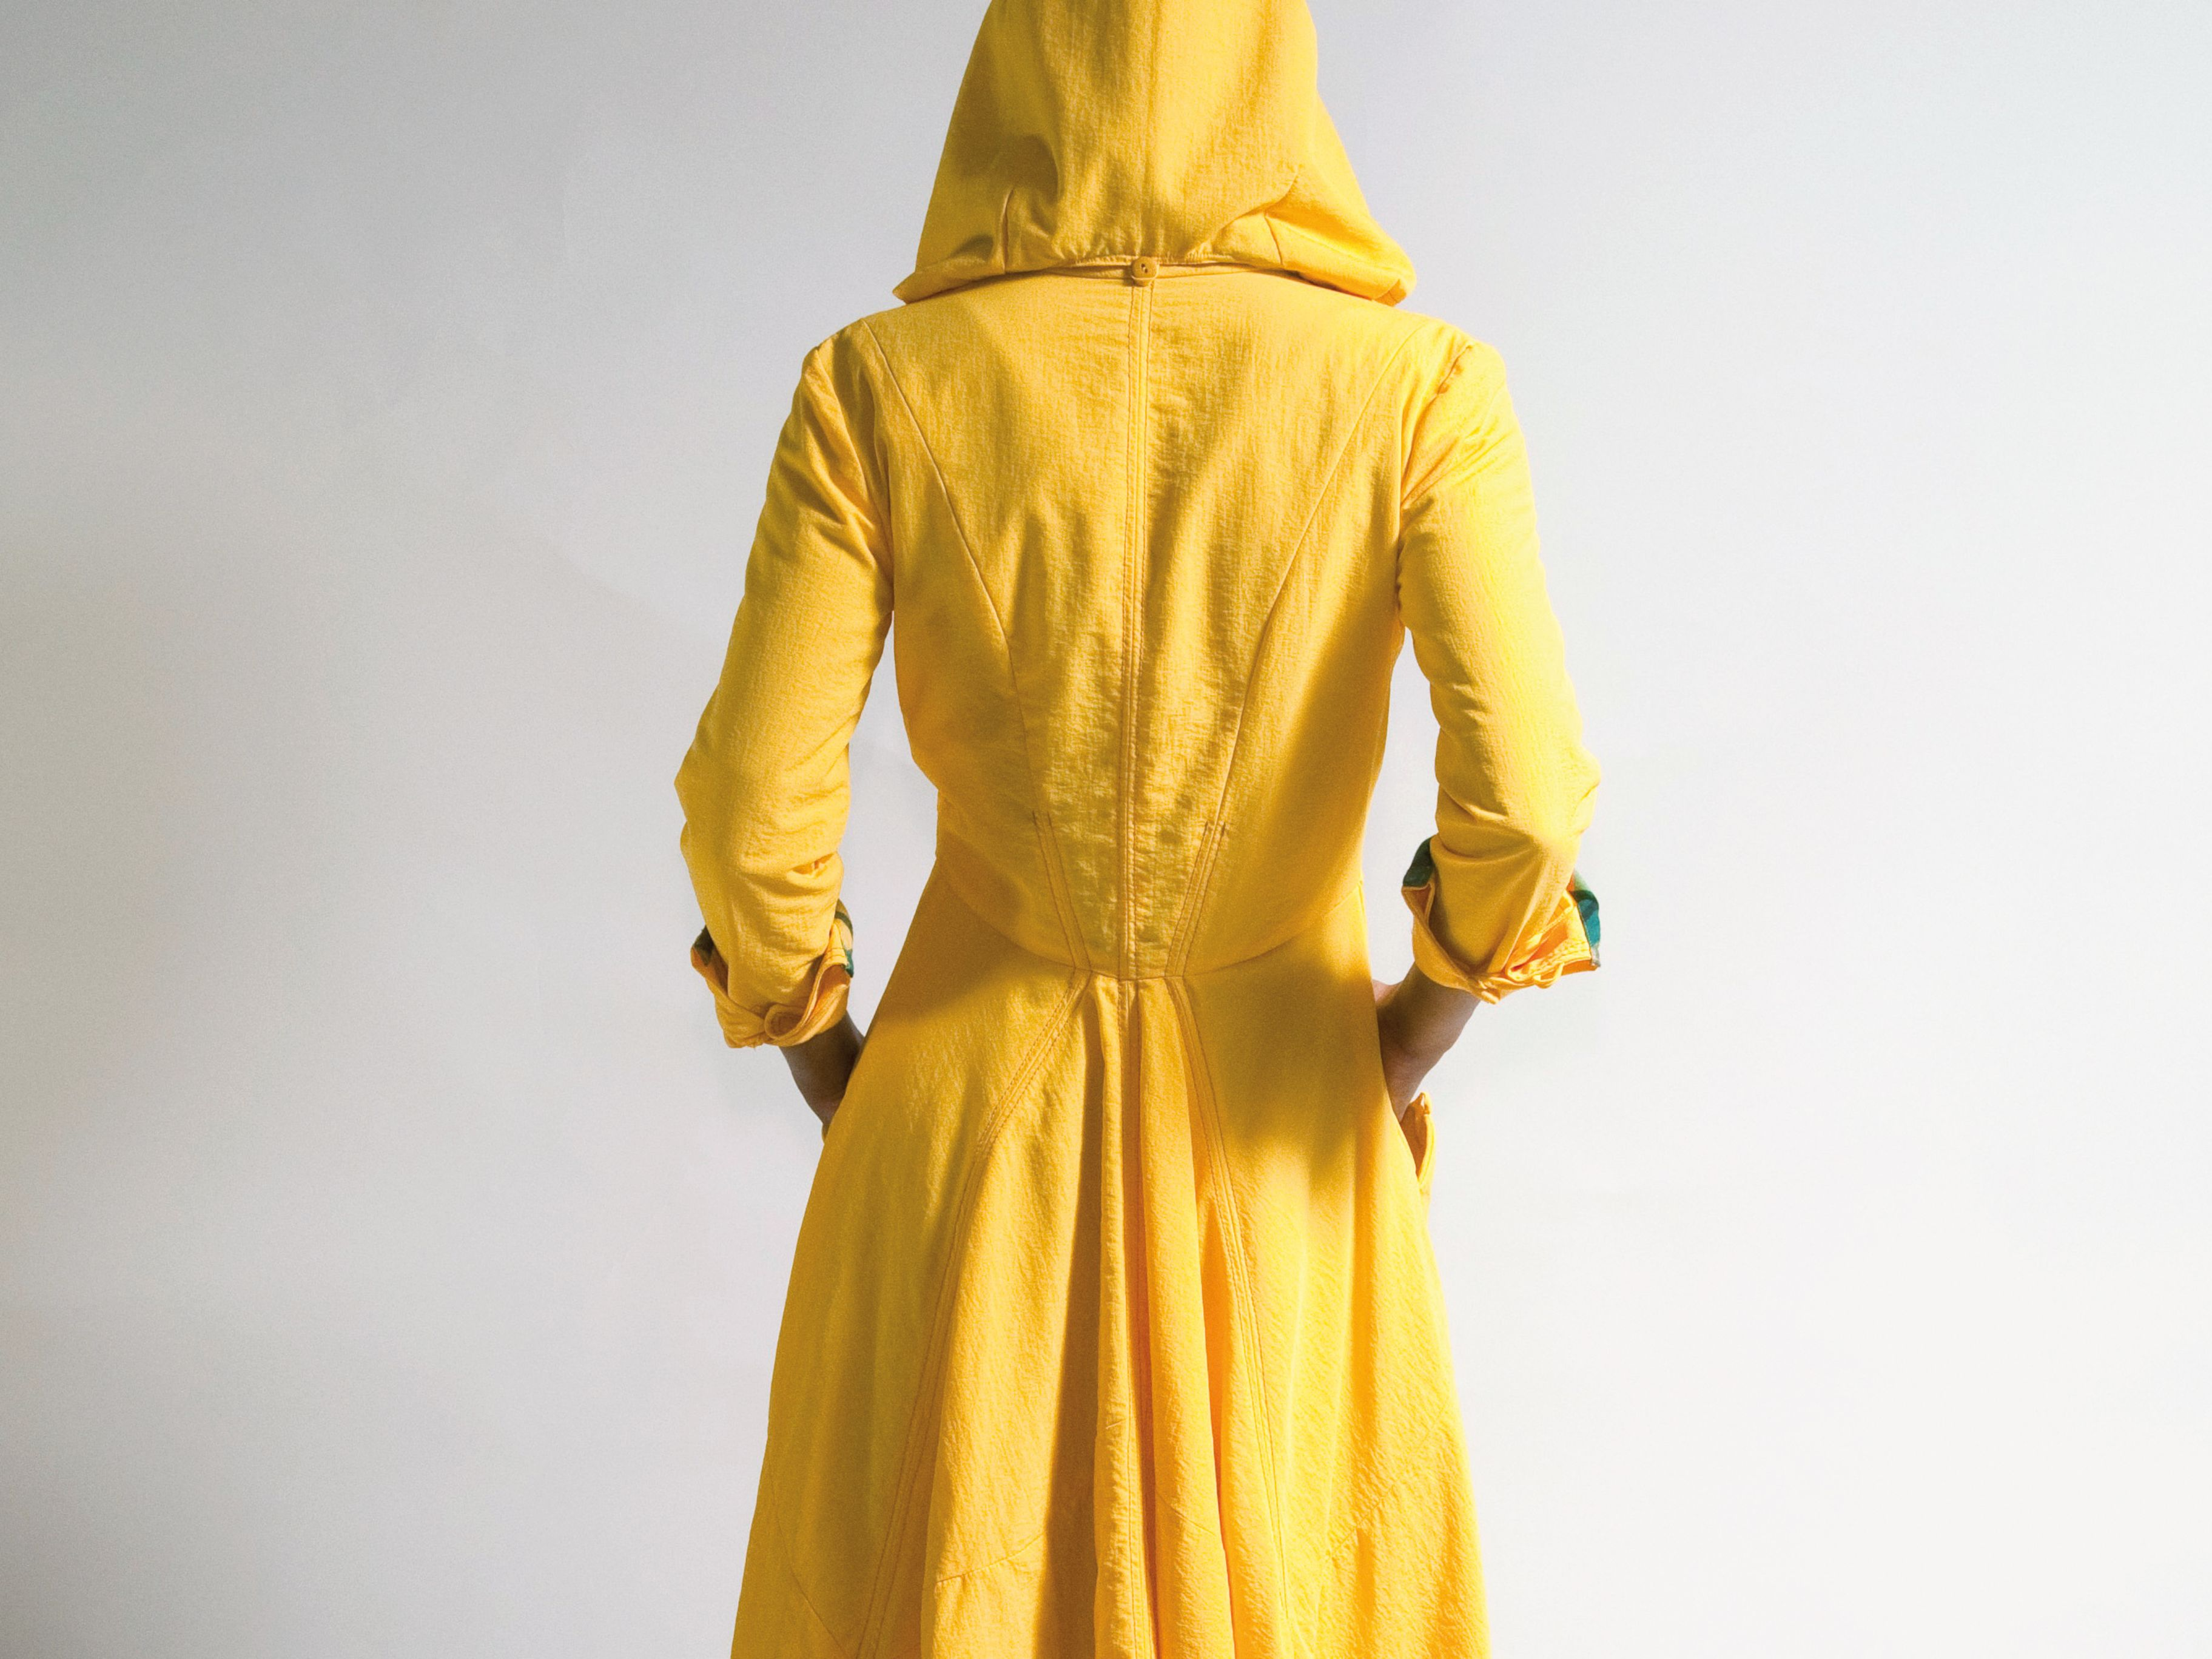 1117 trophy case raincoat txauqo